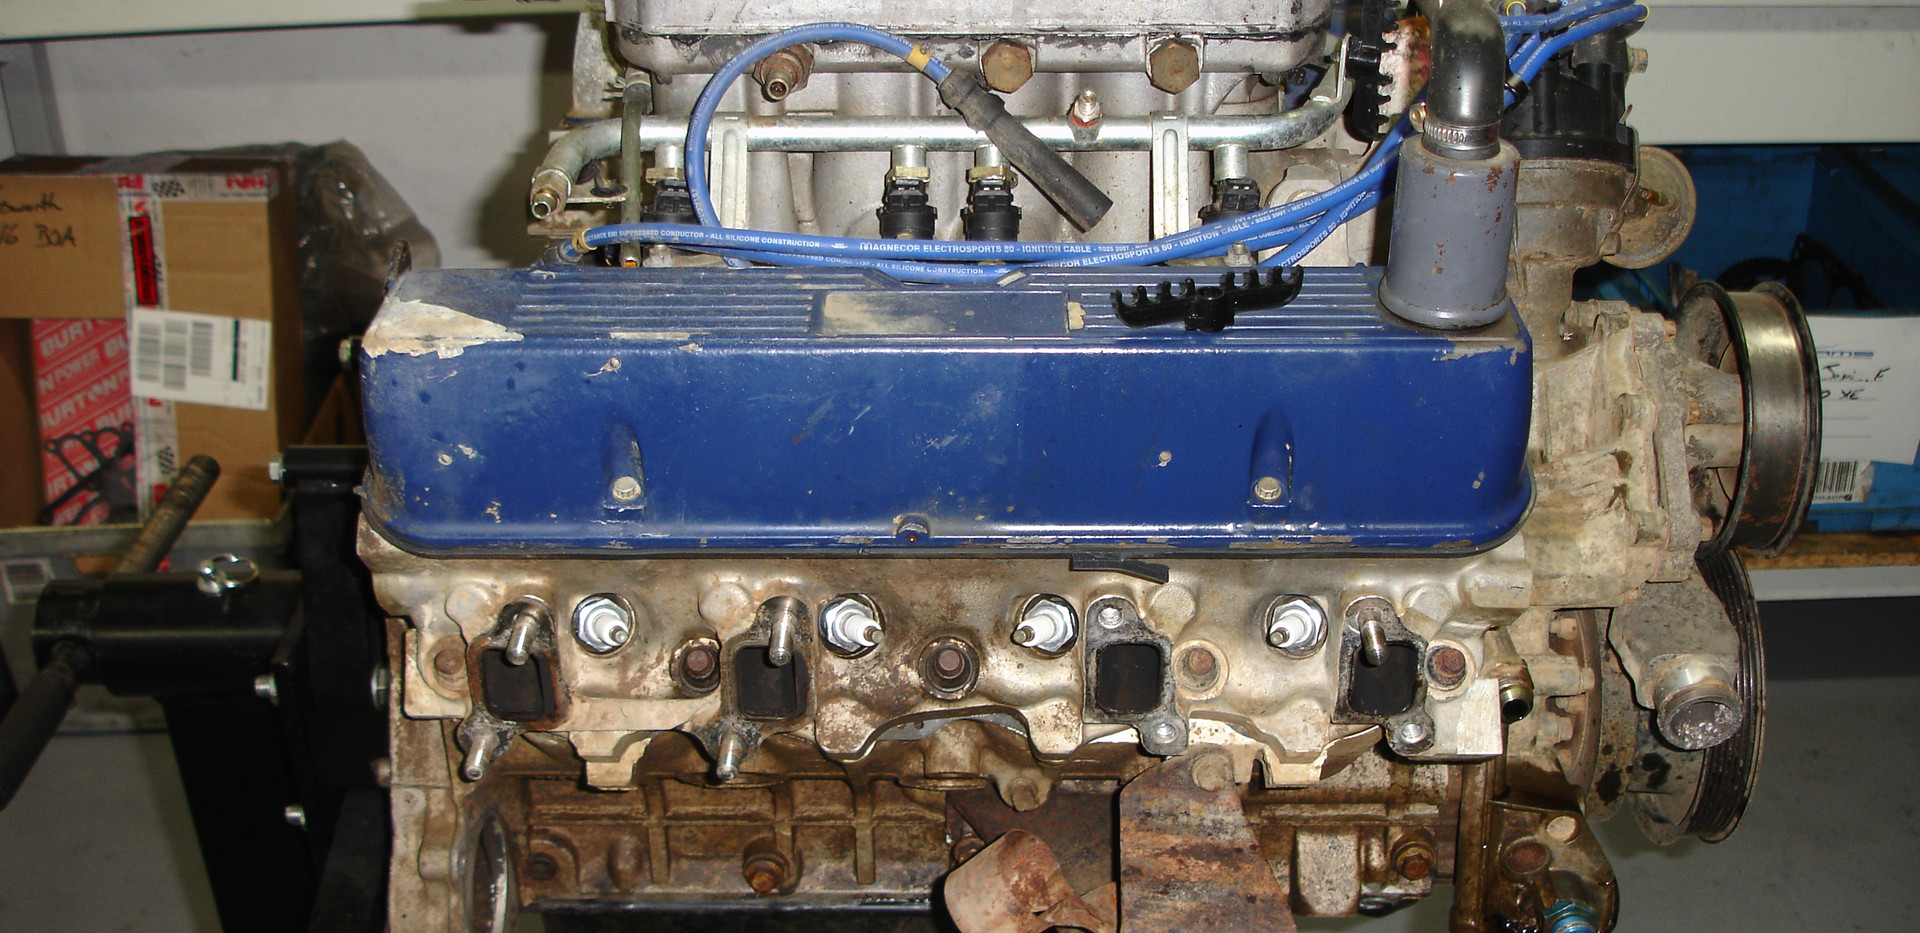 DSC02167.JPG